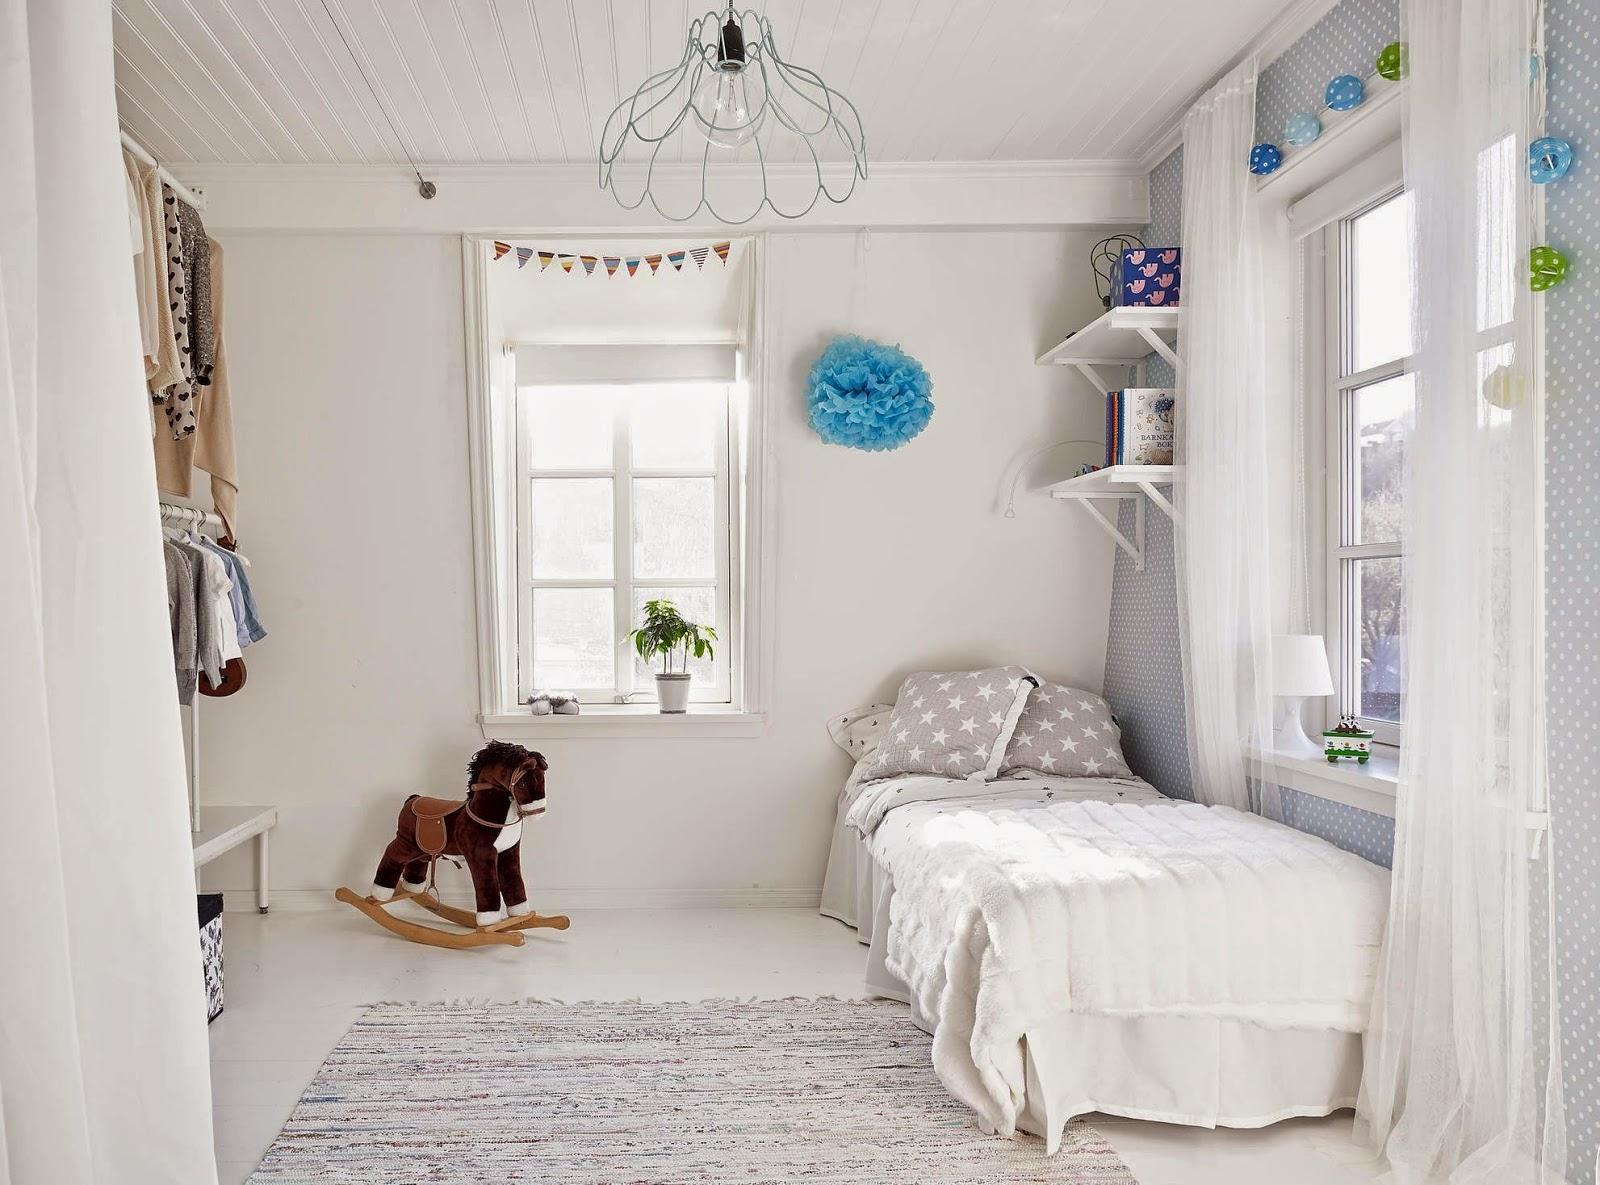 Kinderkamer met open inloopkast